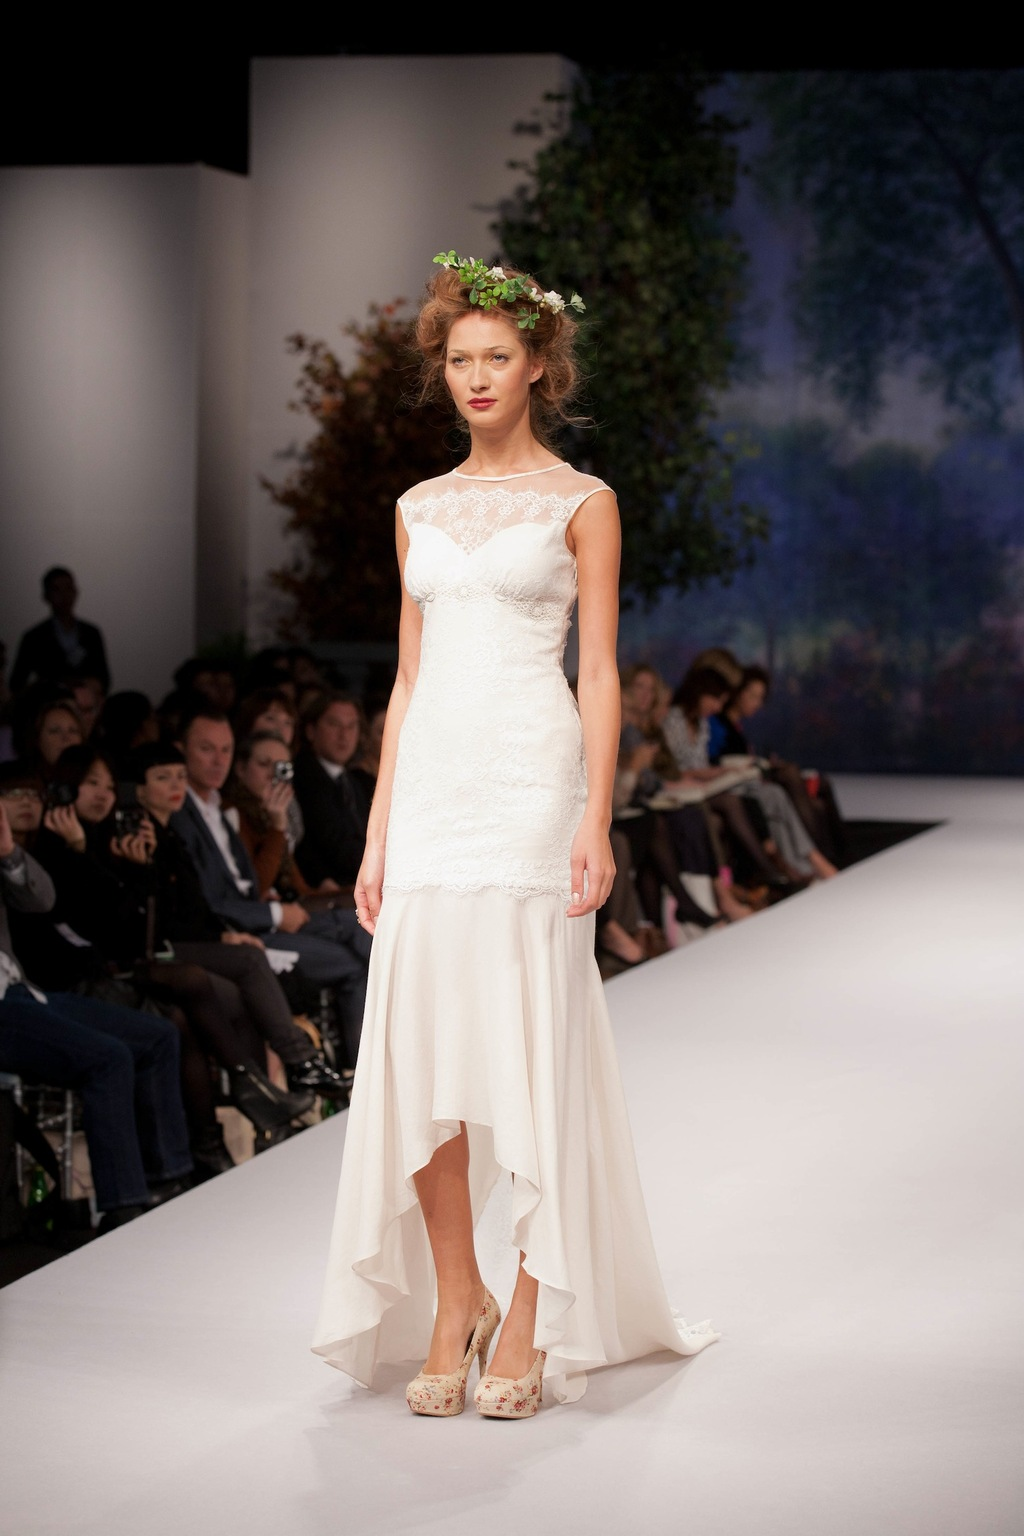 Spring_2012_wedding_dress_claire_pettibone_sophie.full